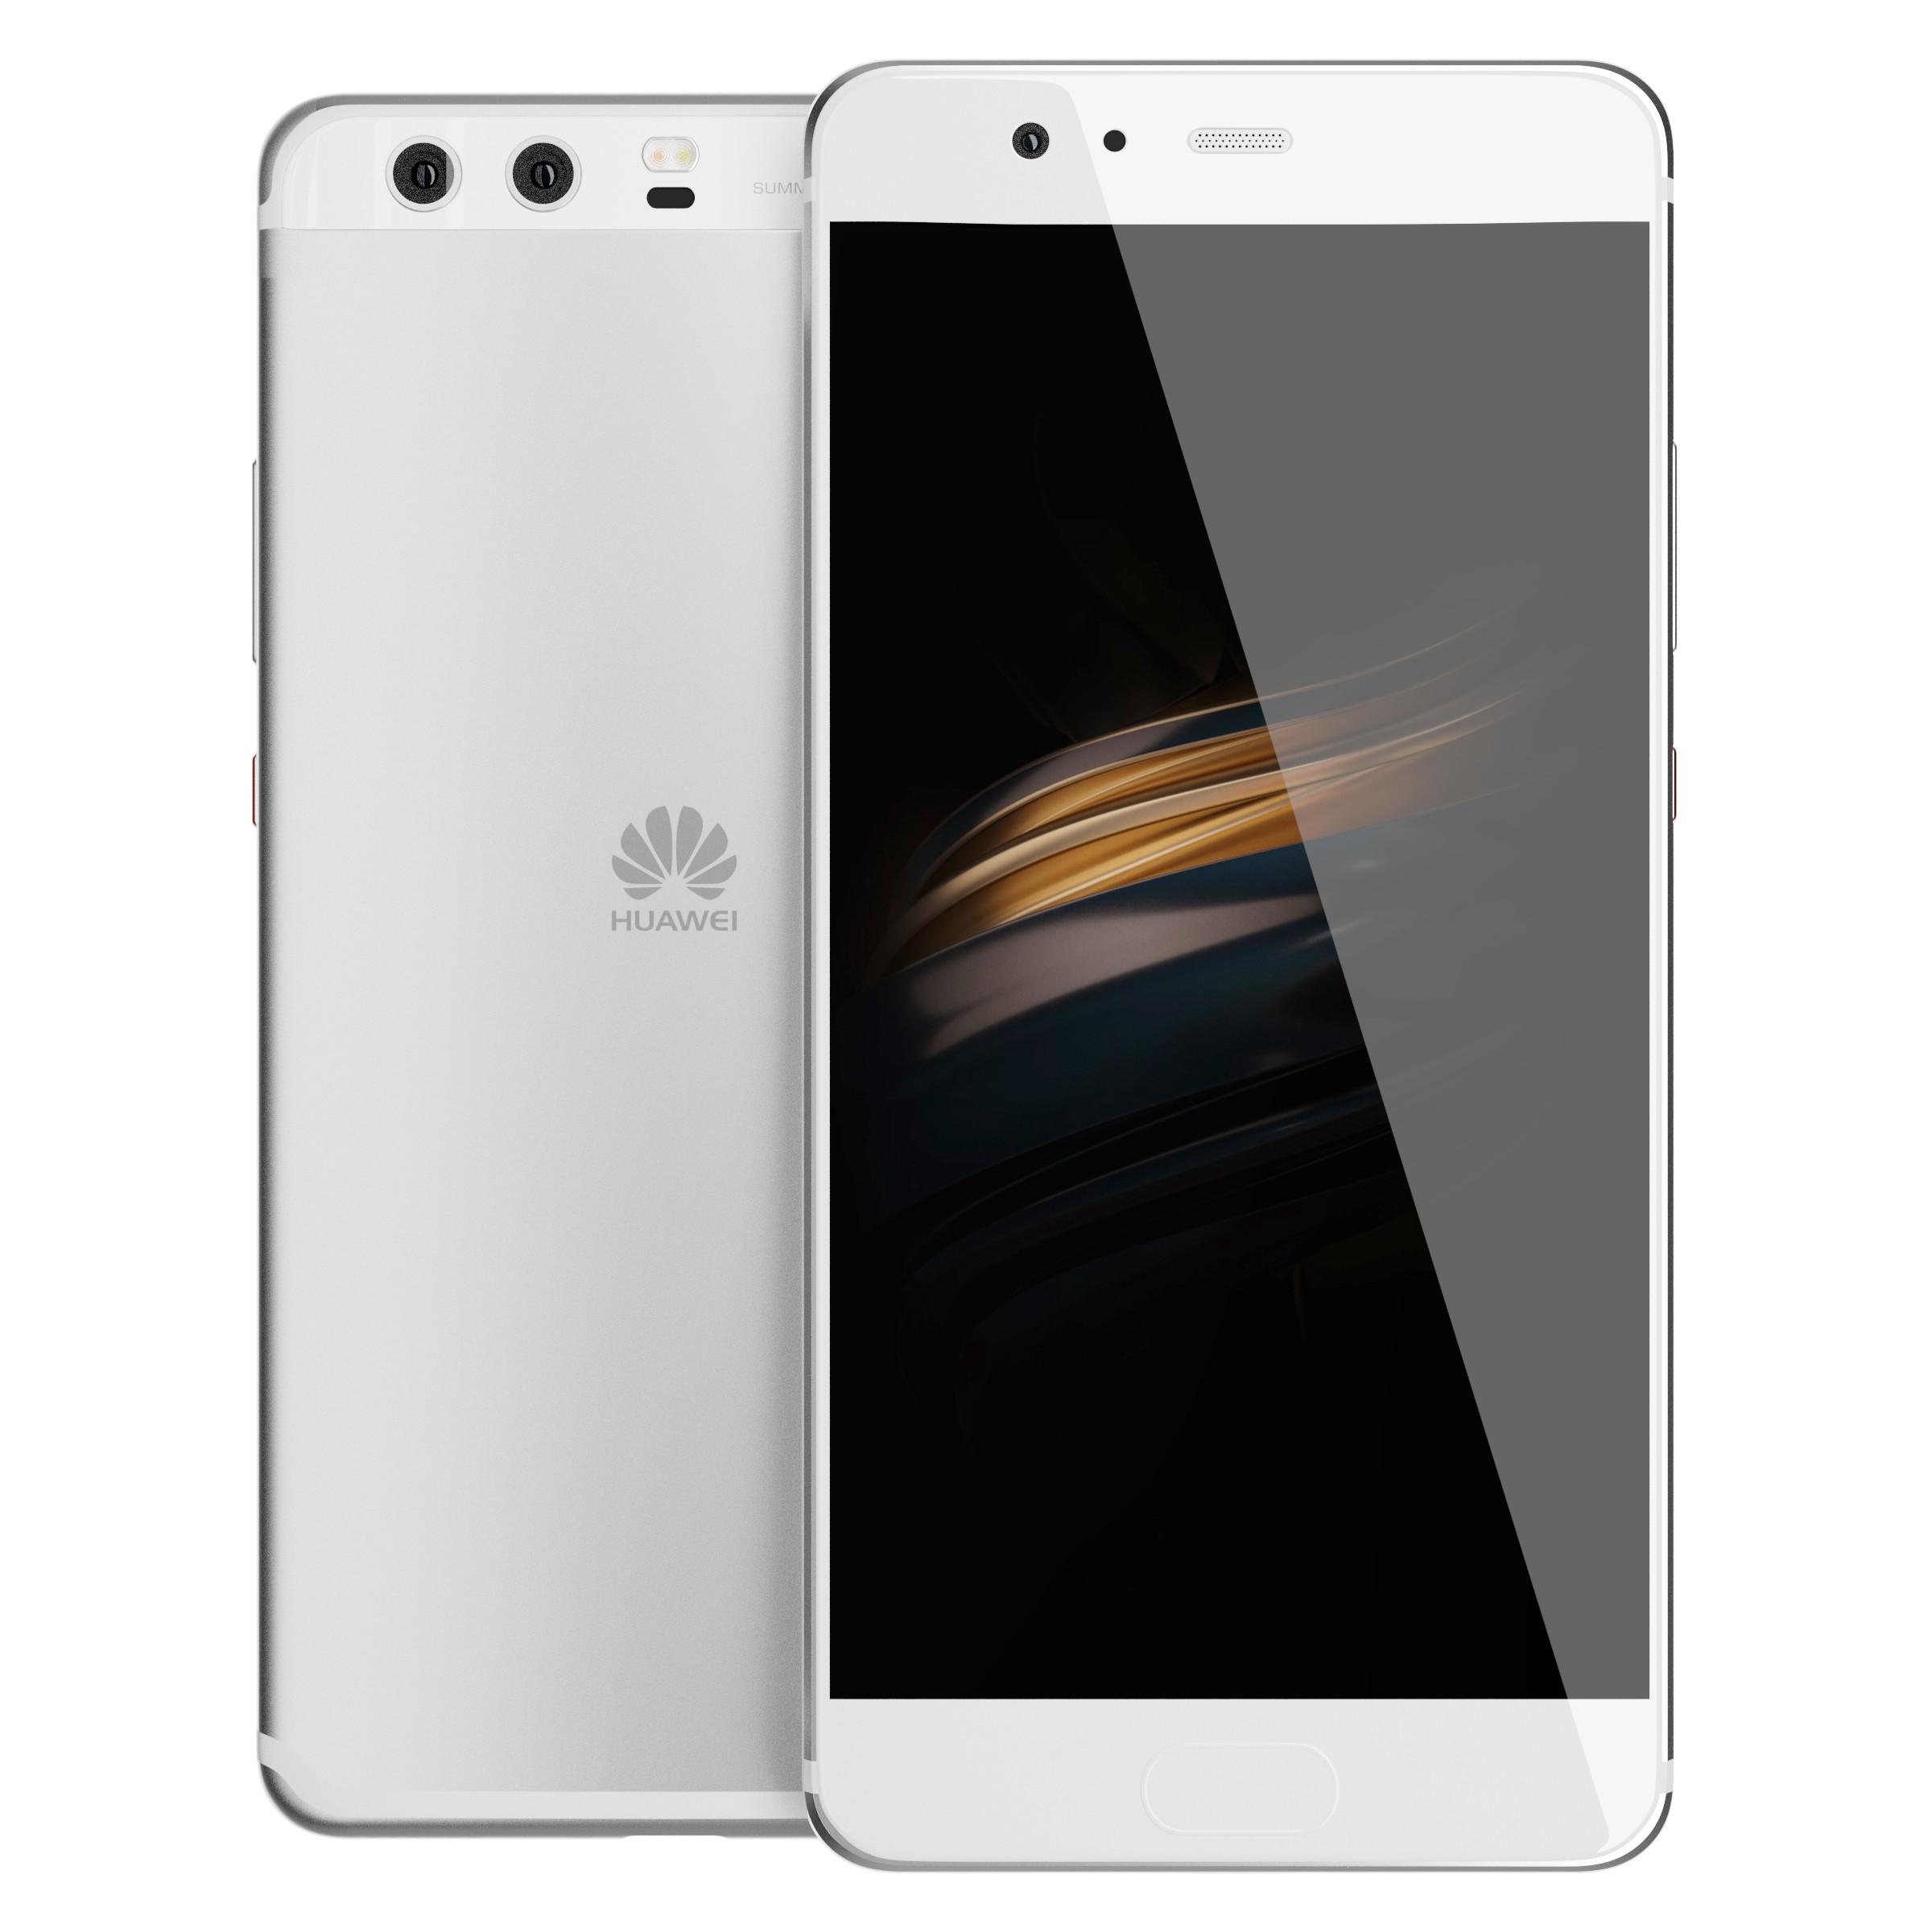 huawei p10 promo smartphone by mmp